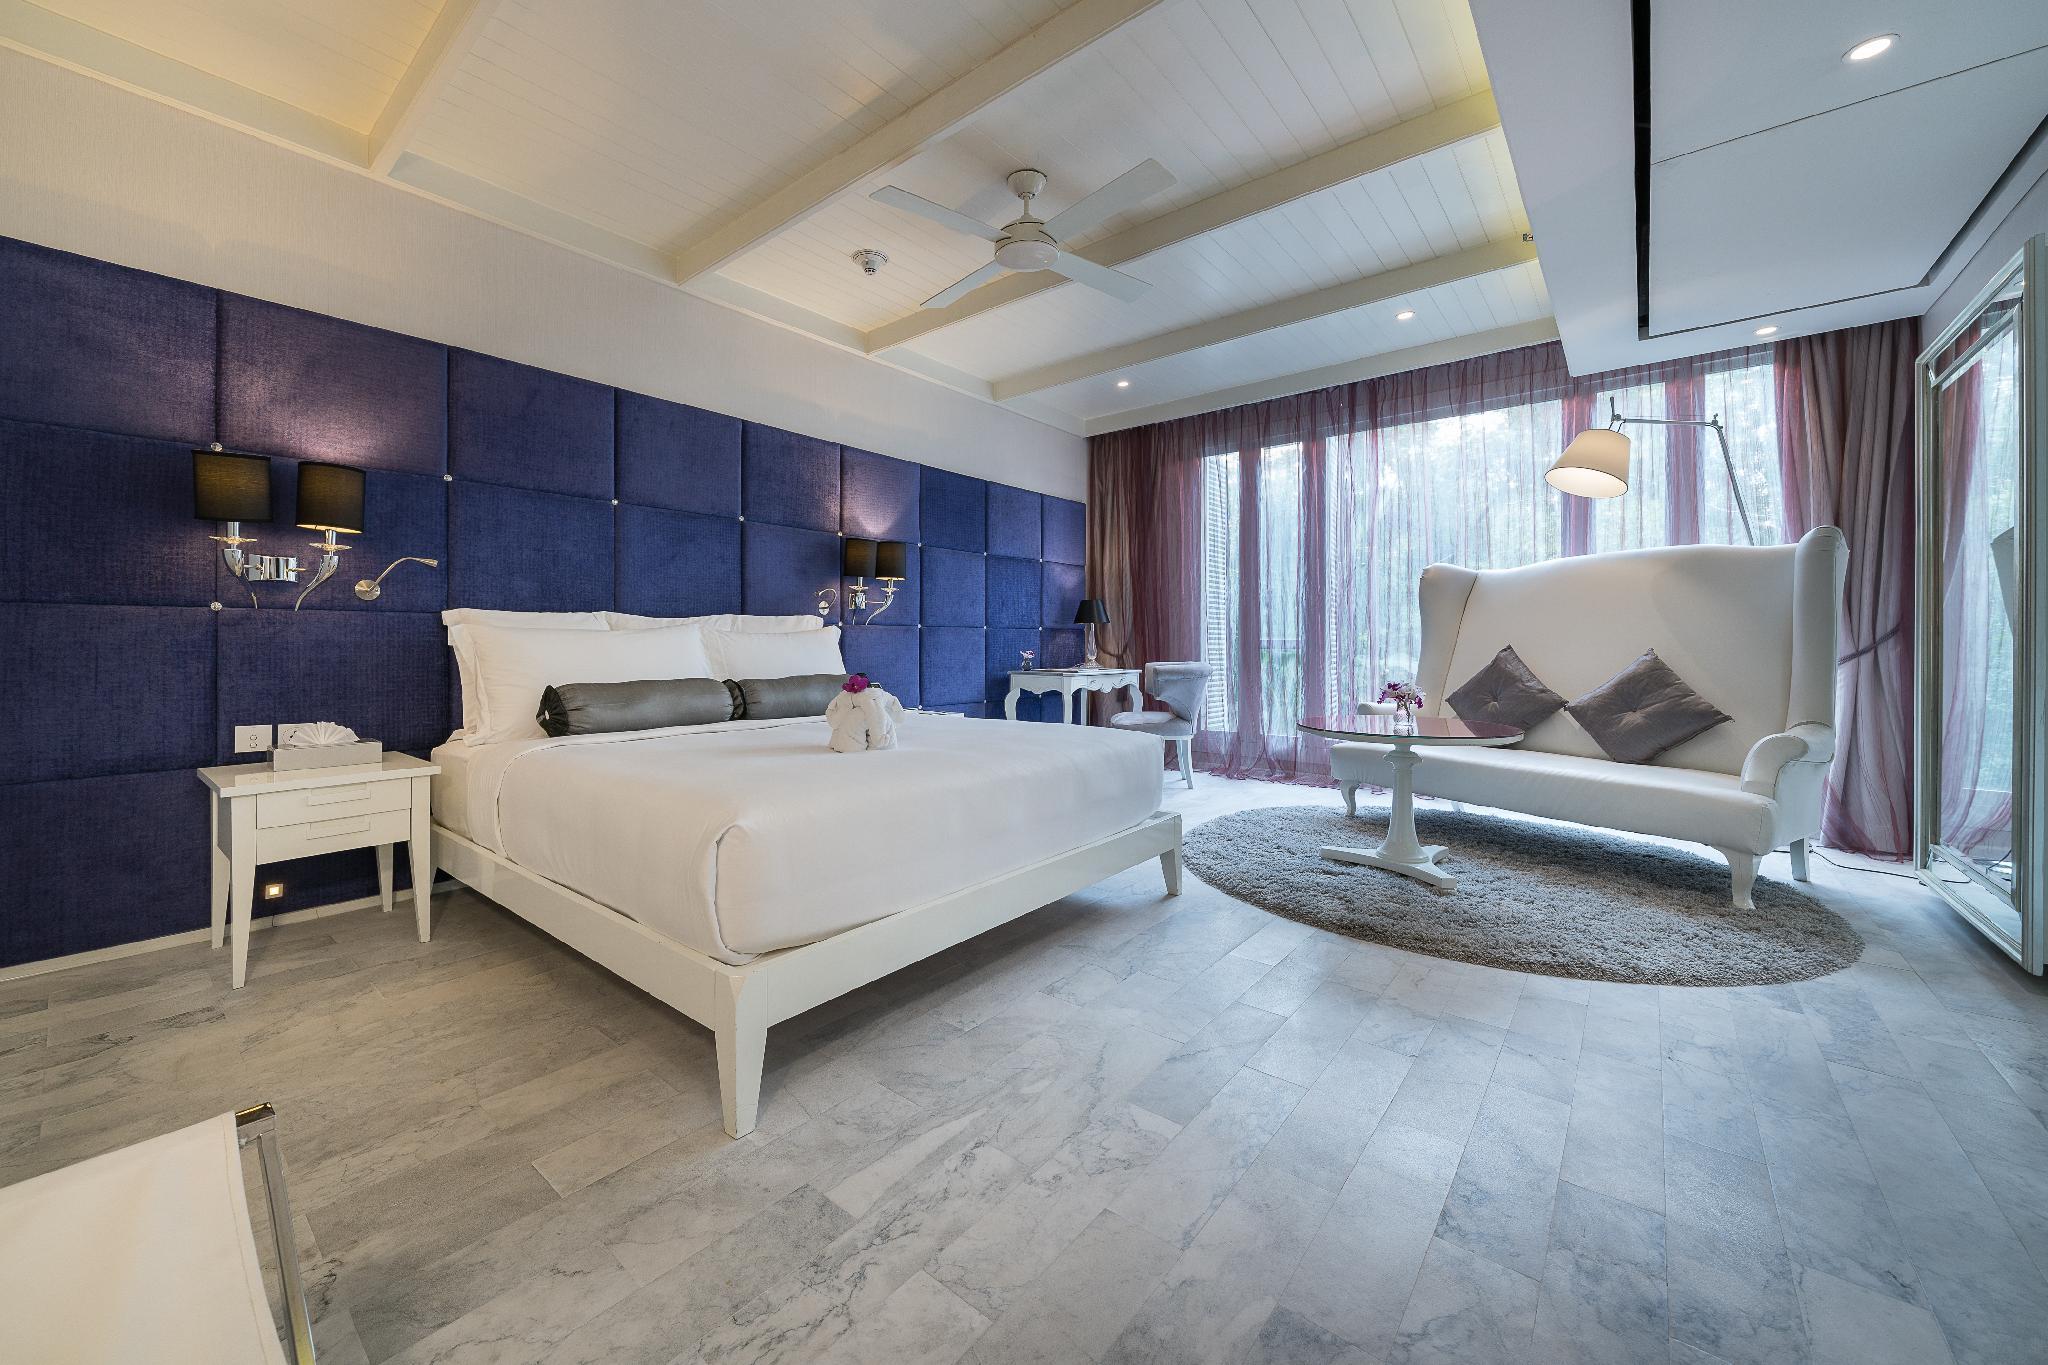 Book Hua Chang Heritage Hotel Bangkok 2019 Prices From A 127